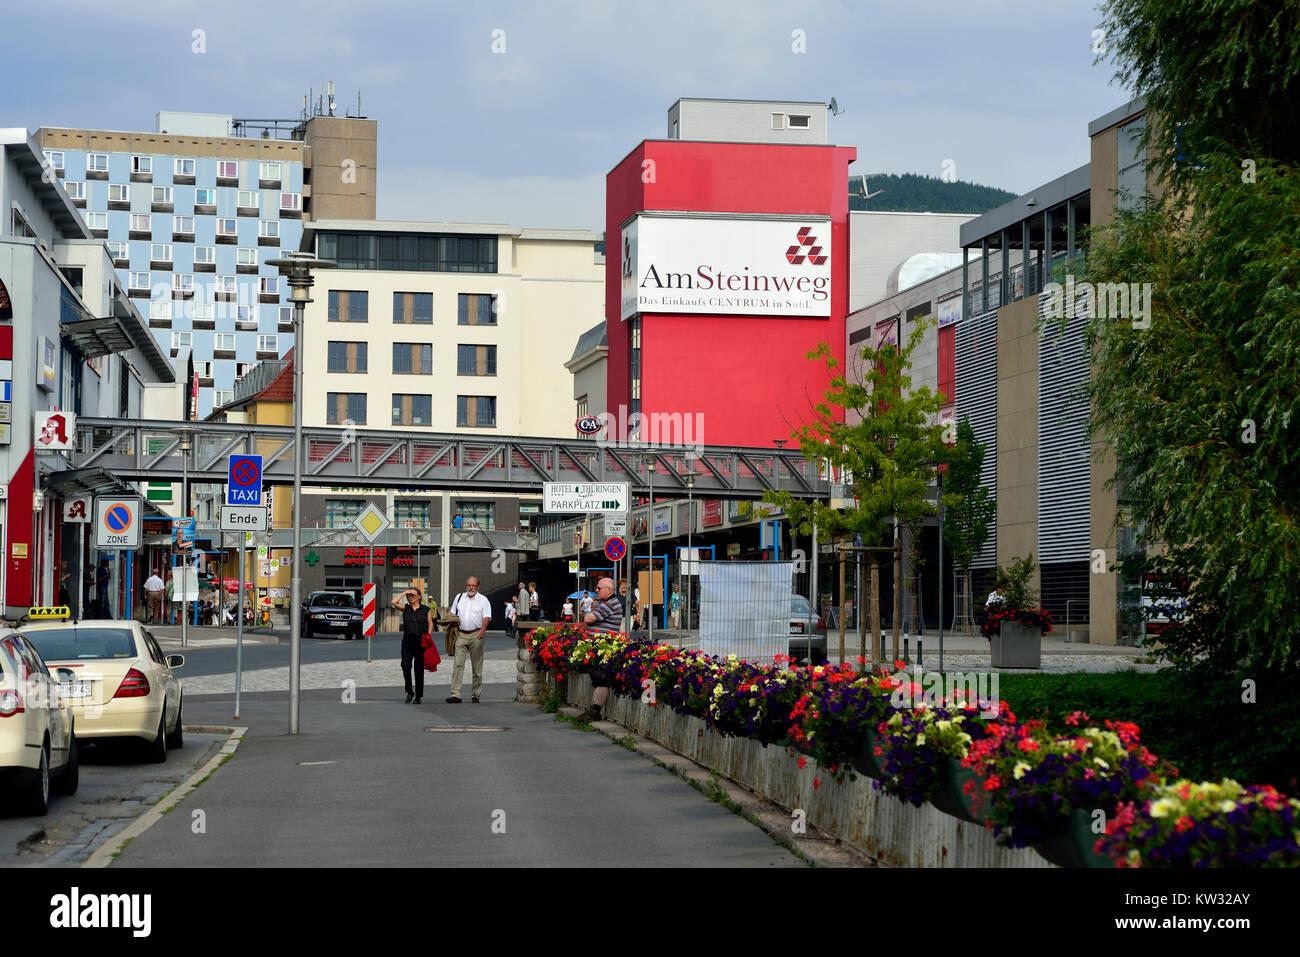 Shopping centre in the stone way, Thuringia, Wallowing, Einkaufszentrum Am Steinweg, Thueringen, Suhl - Stock Image